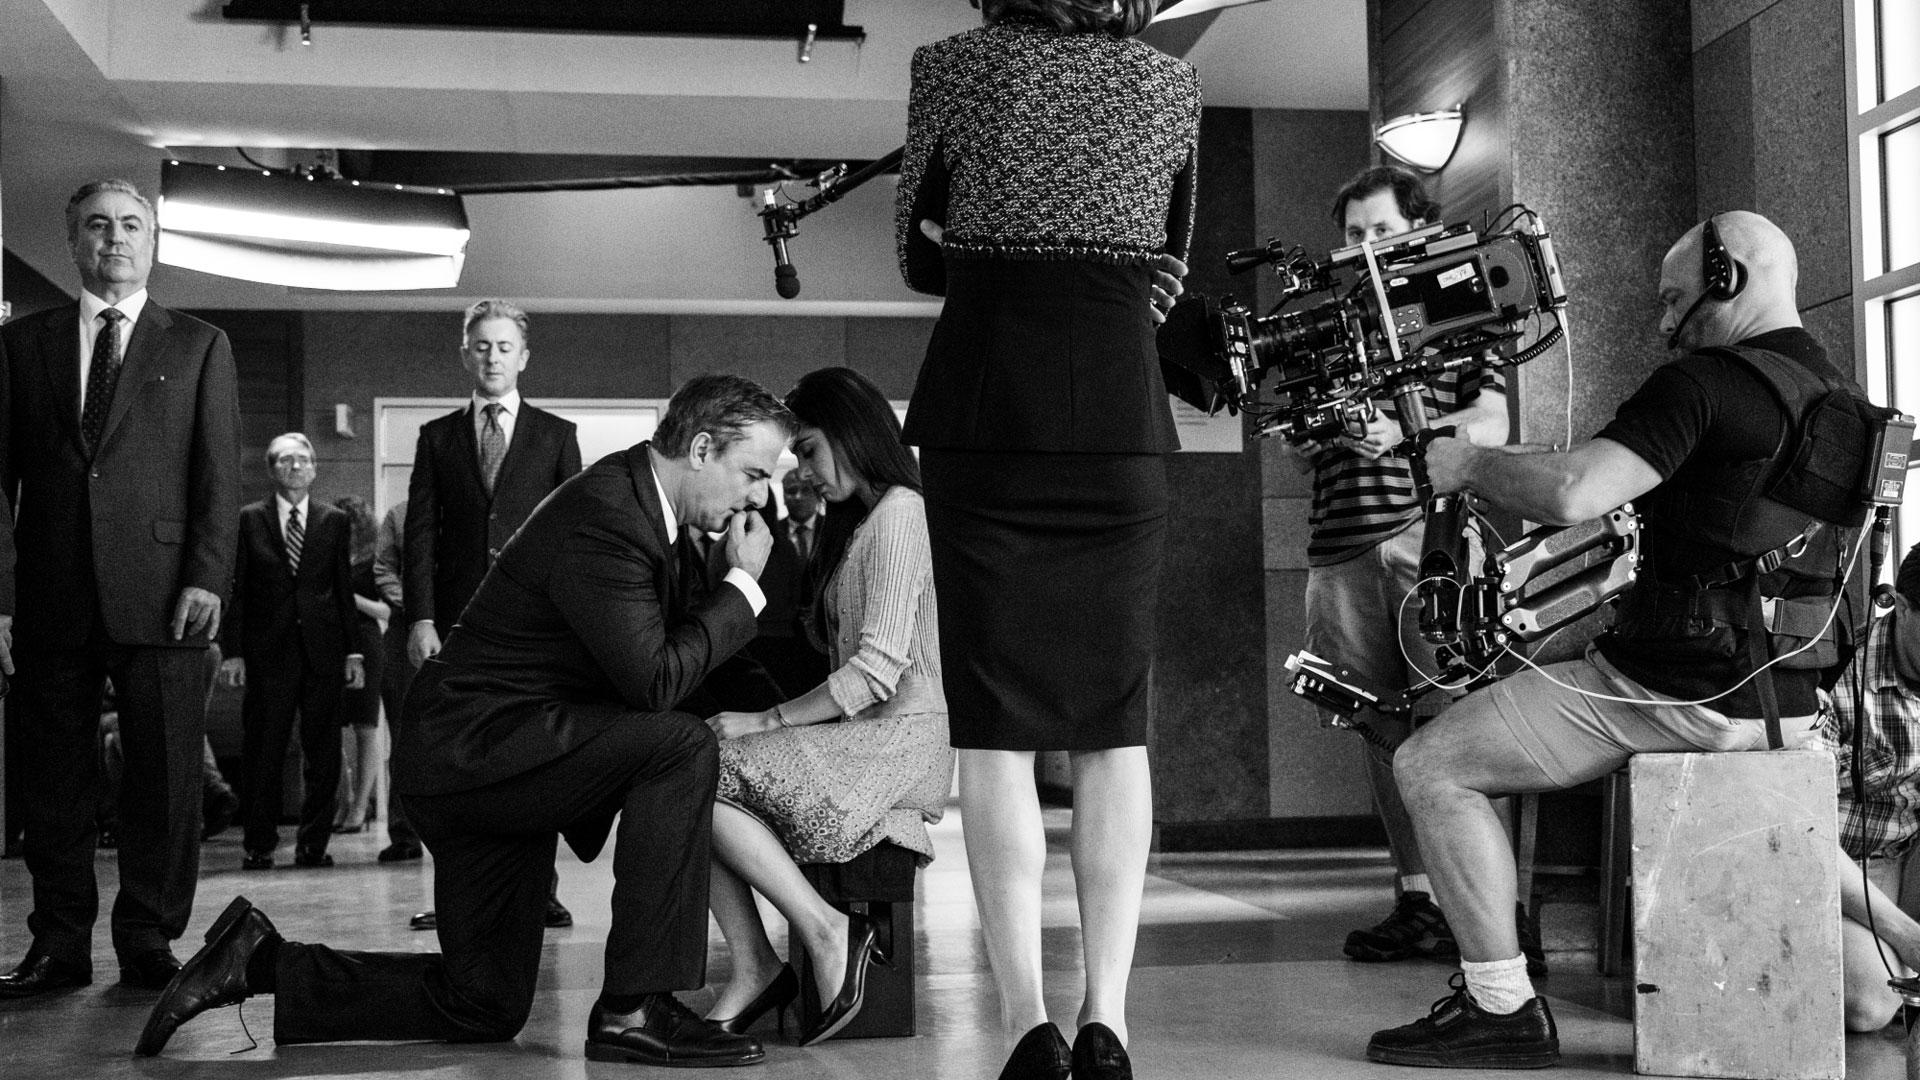 Chris Noth gets down on bended knee in an emotional scene as Peter Florrick.